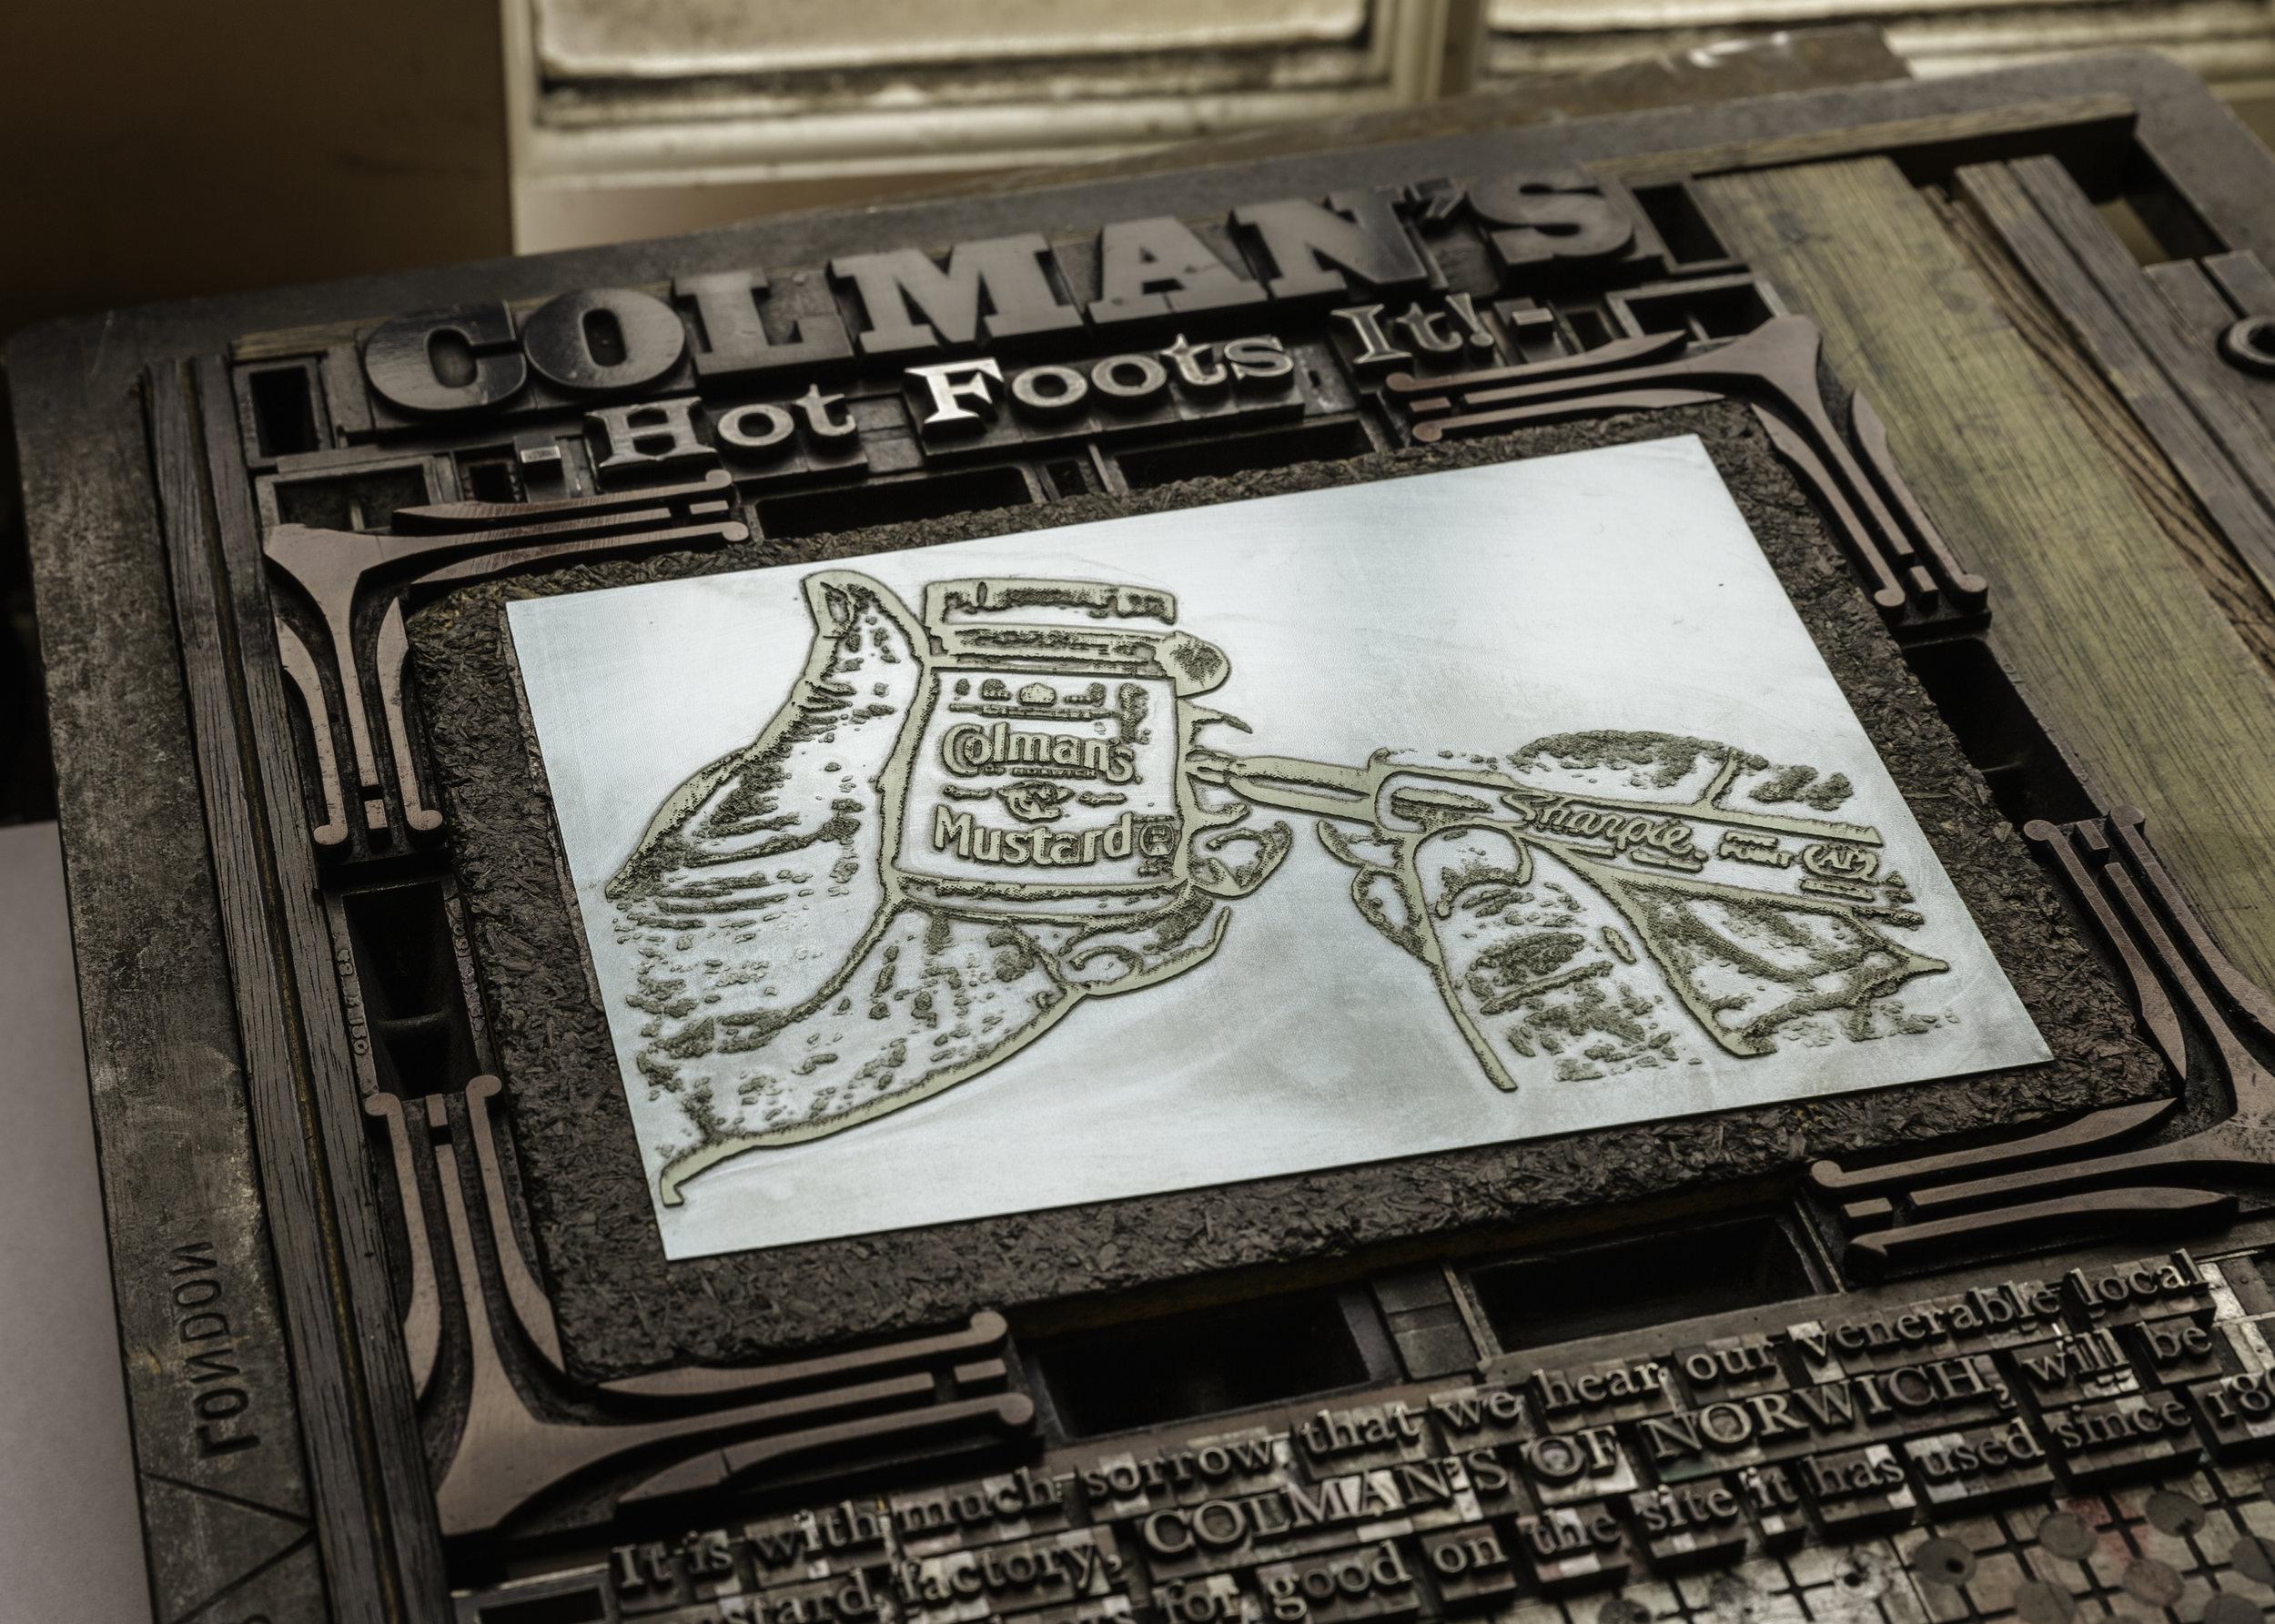 Colman Mustard - Jarrold Print Museum